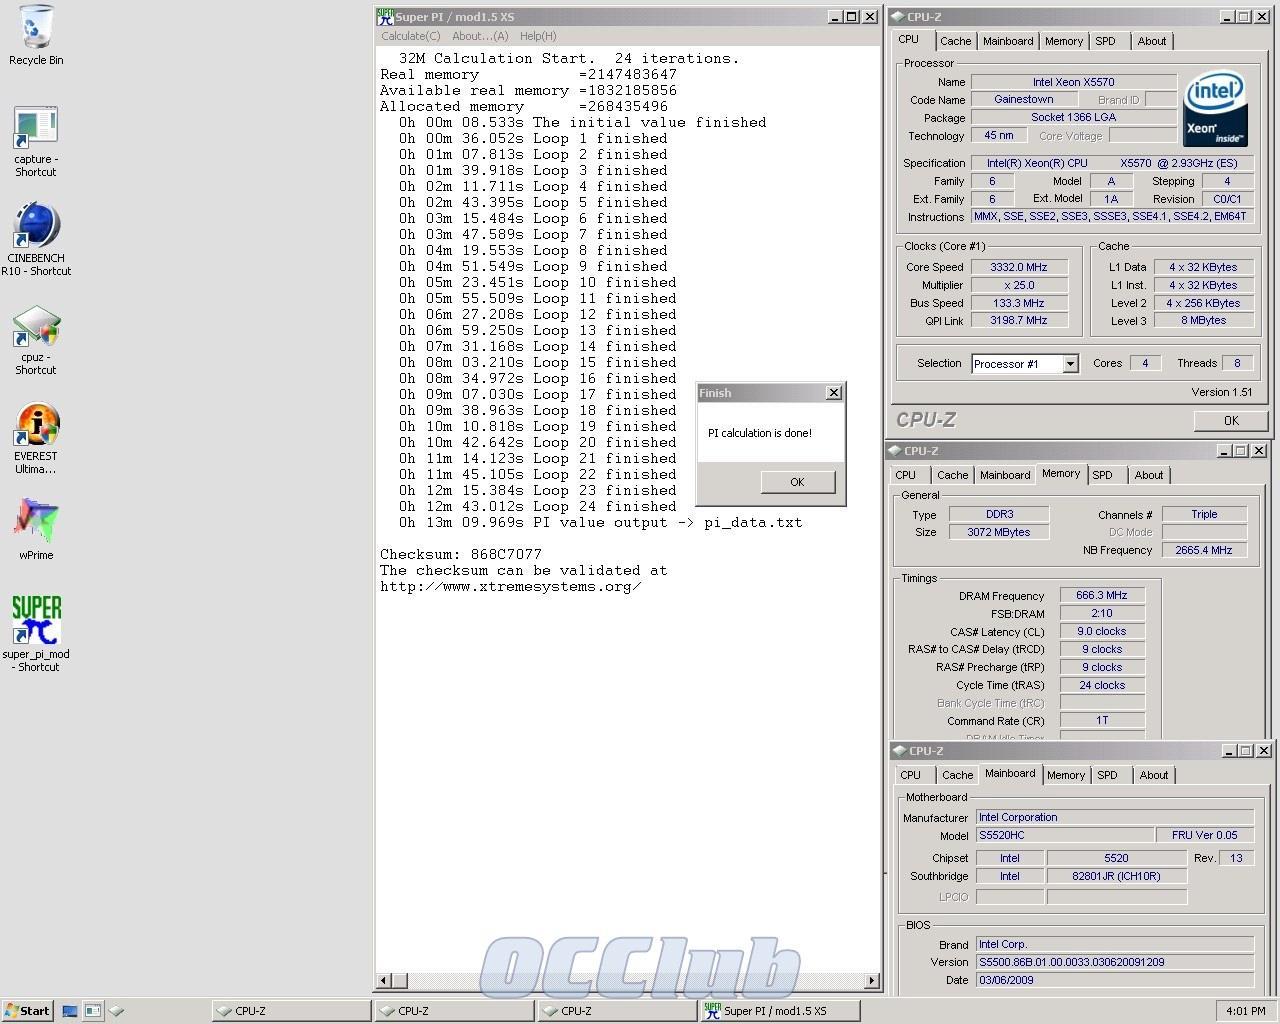 SuperPi 32M Xeon X5570